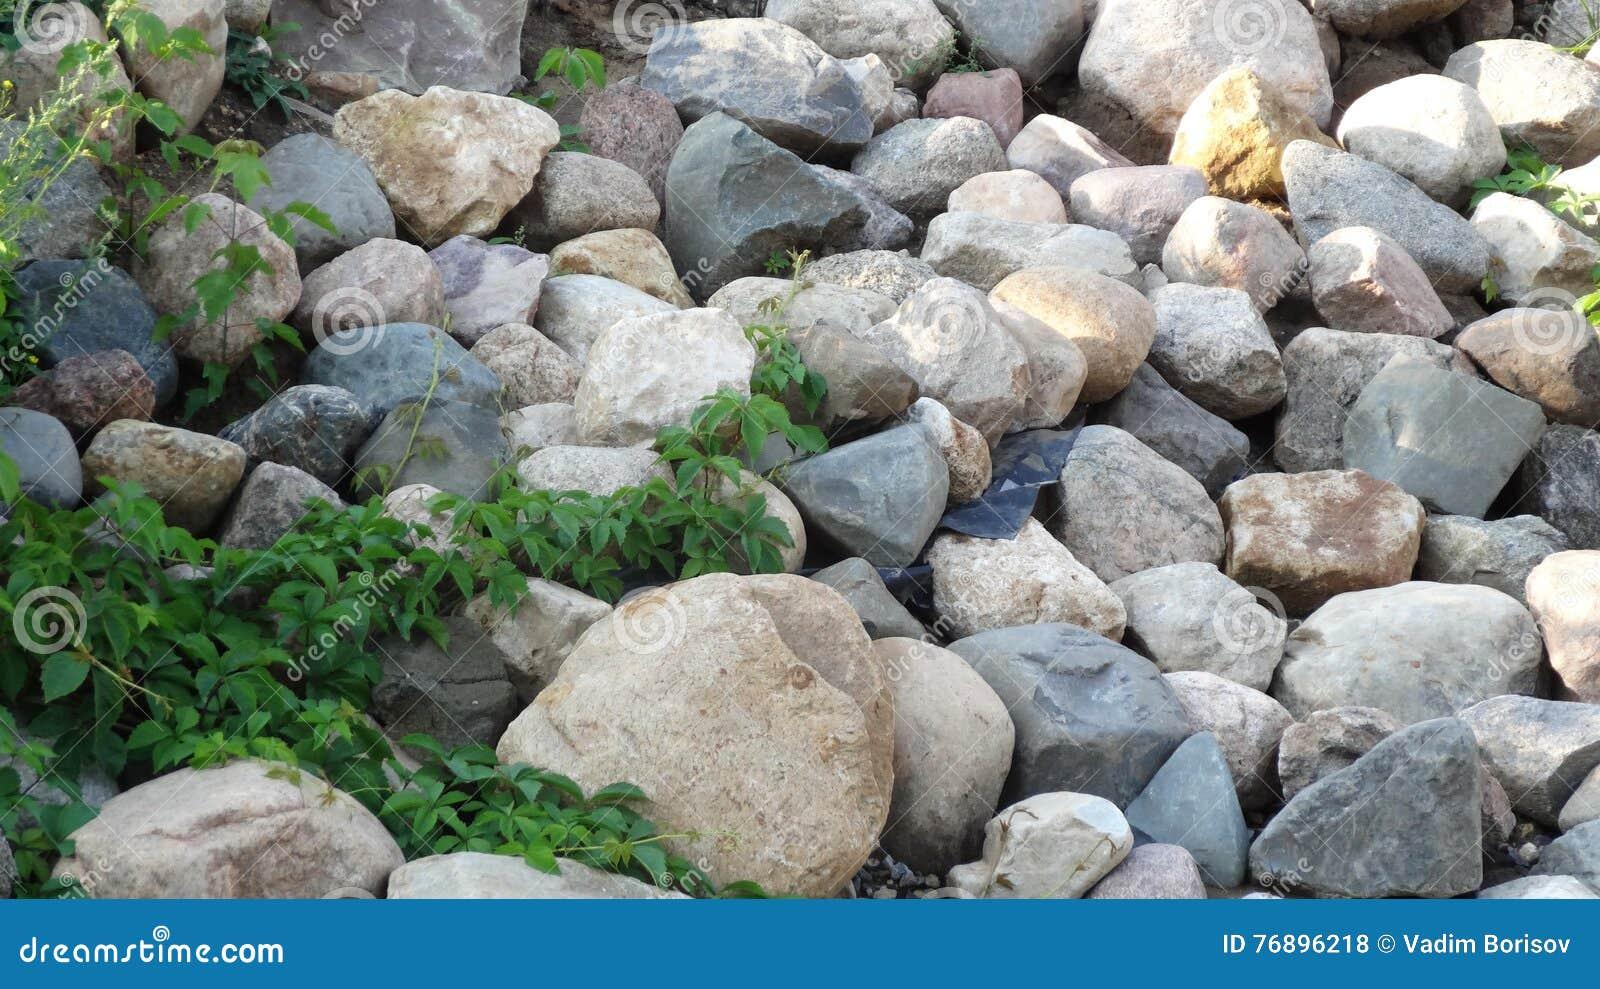 Lot of stones background